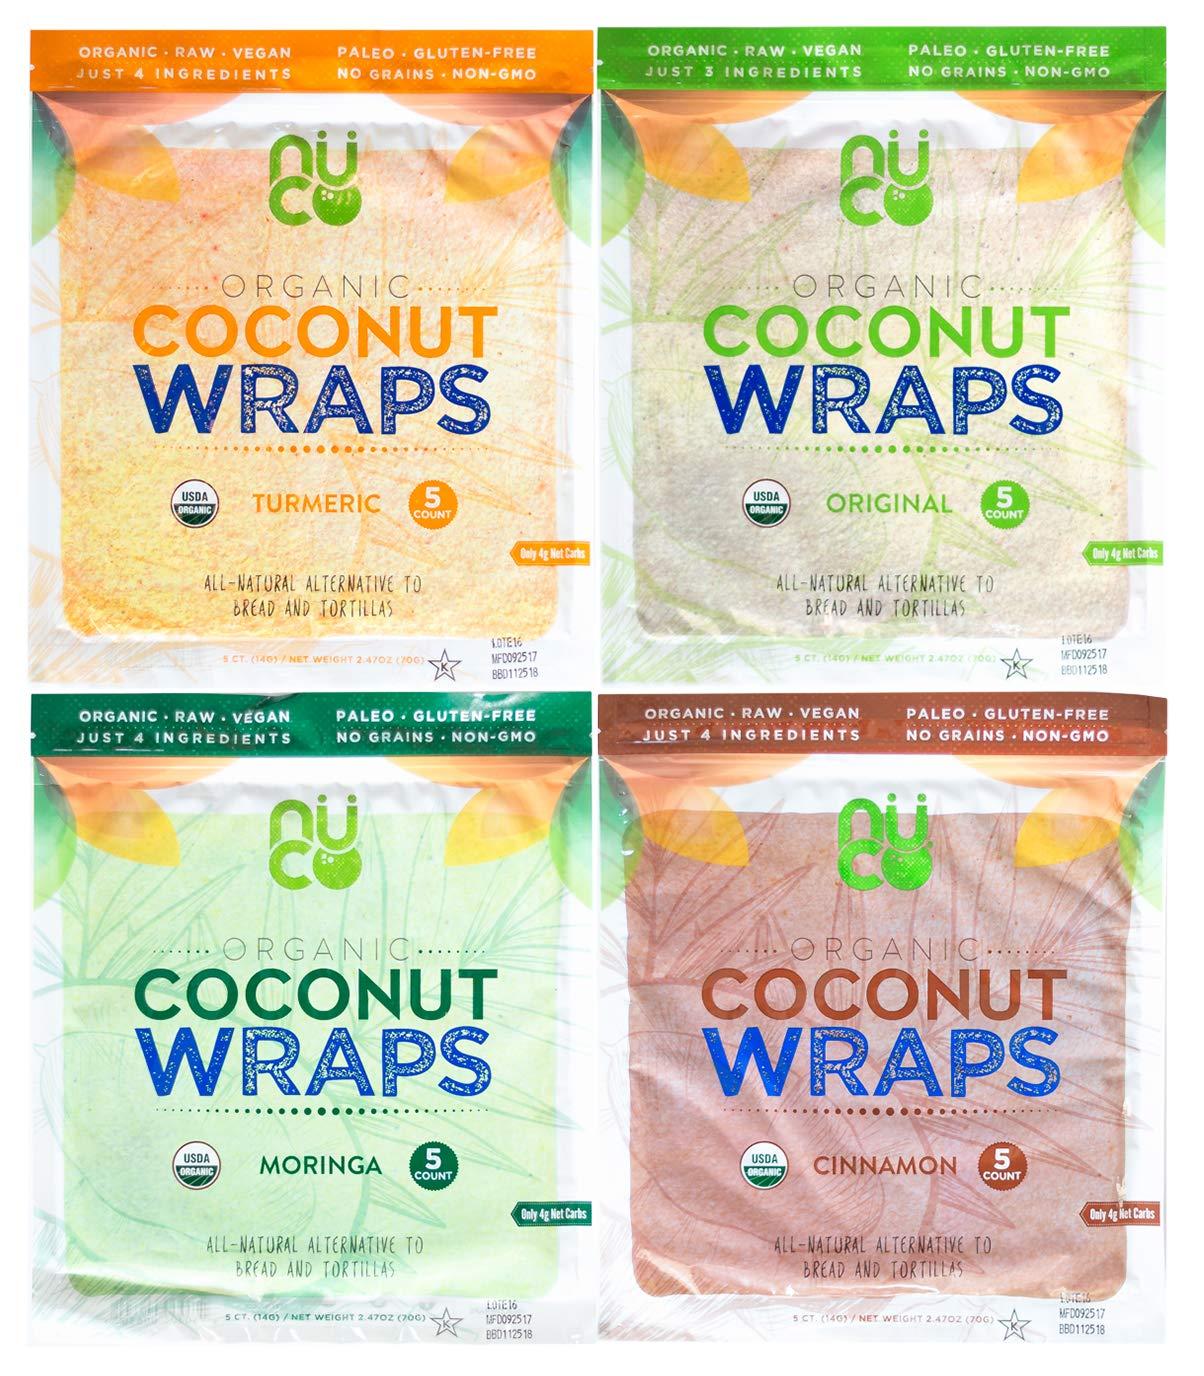 NUCO Organic Coconut Wraps Variety Pack: Original, Turmeric, Moringa, and Cinnamon (20 wraps total) by NUCO